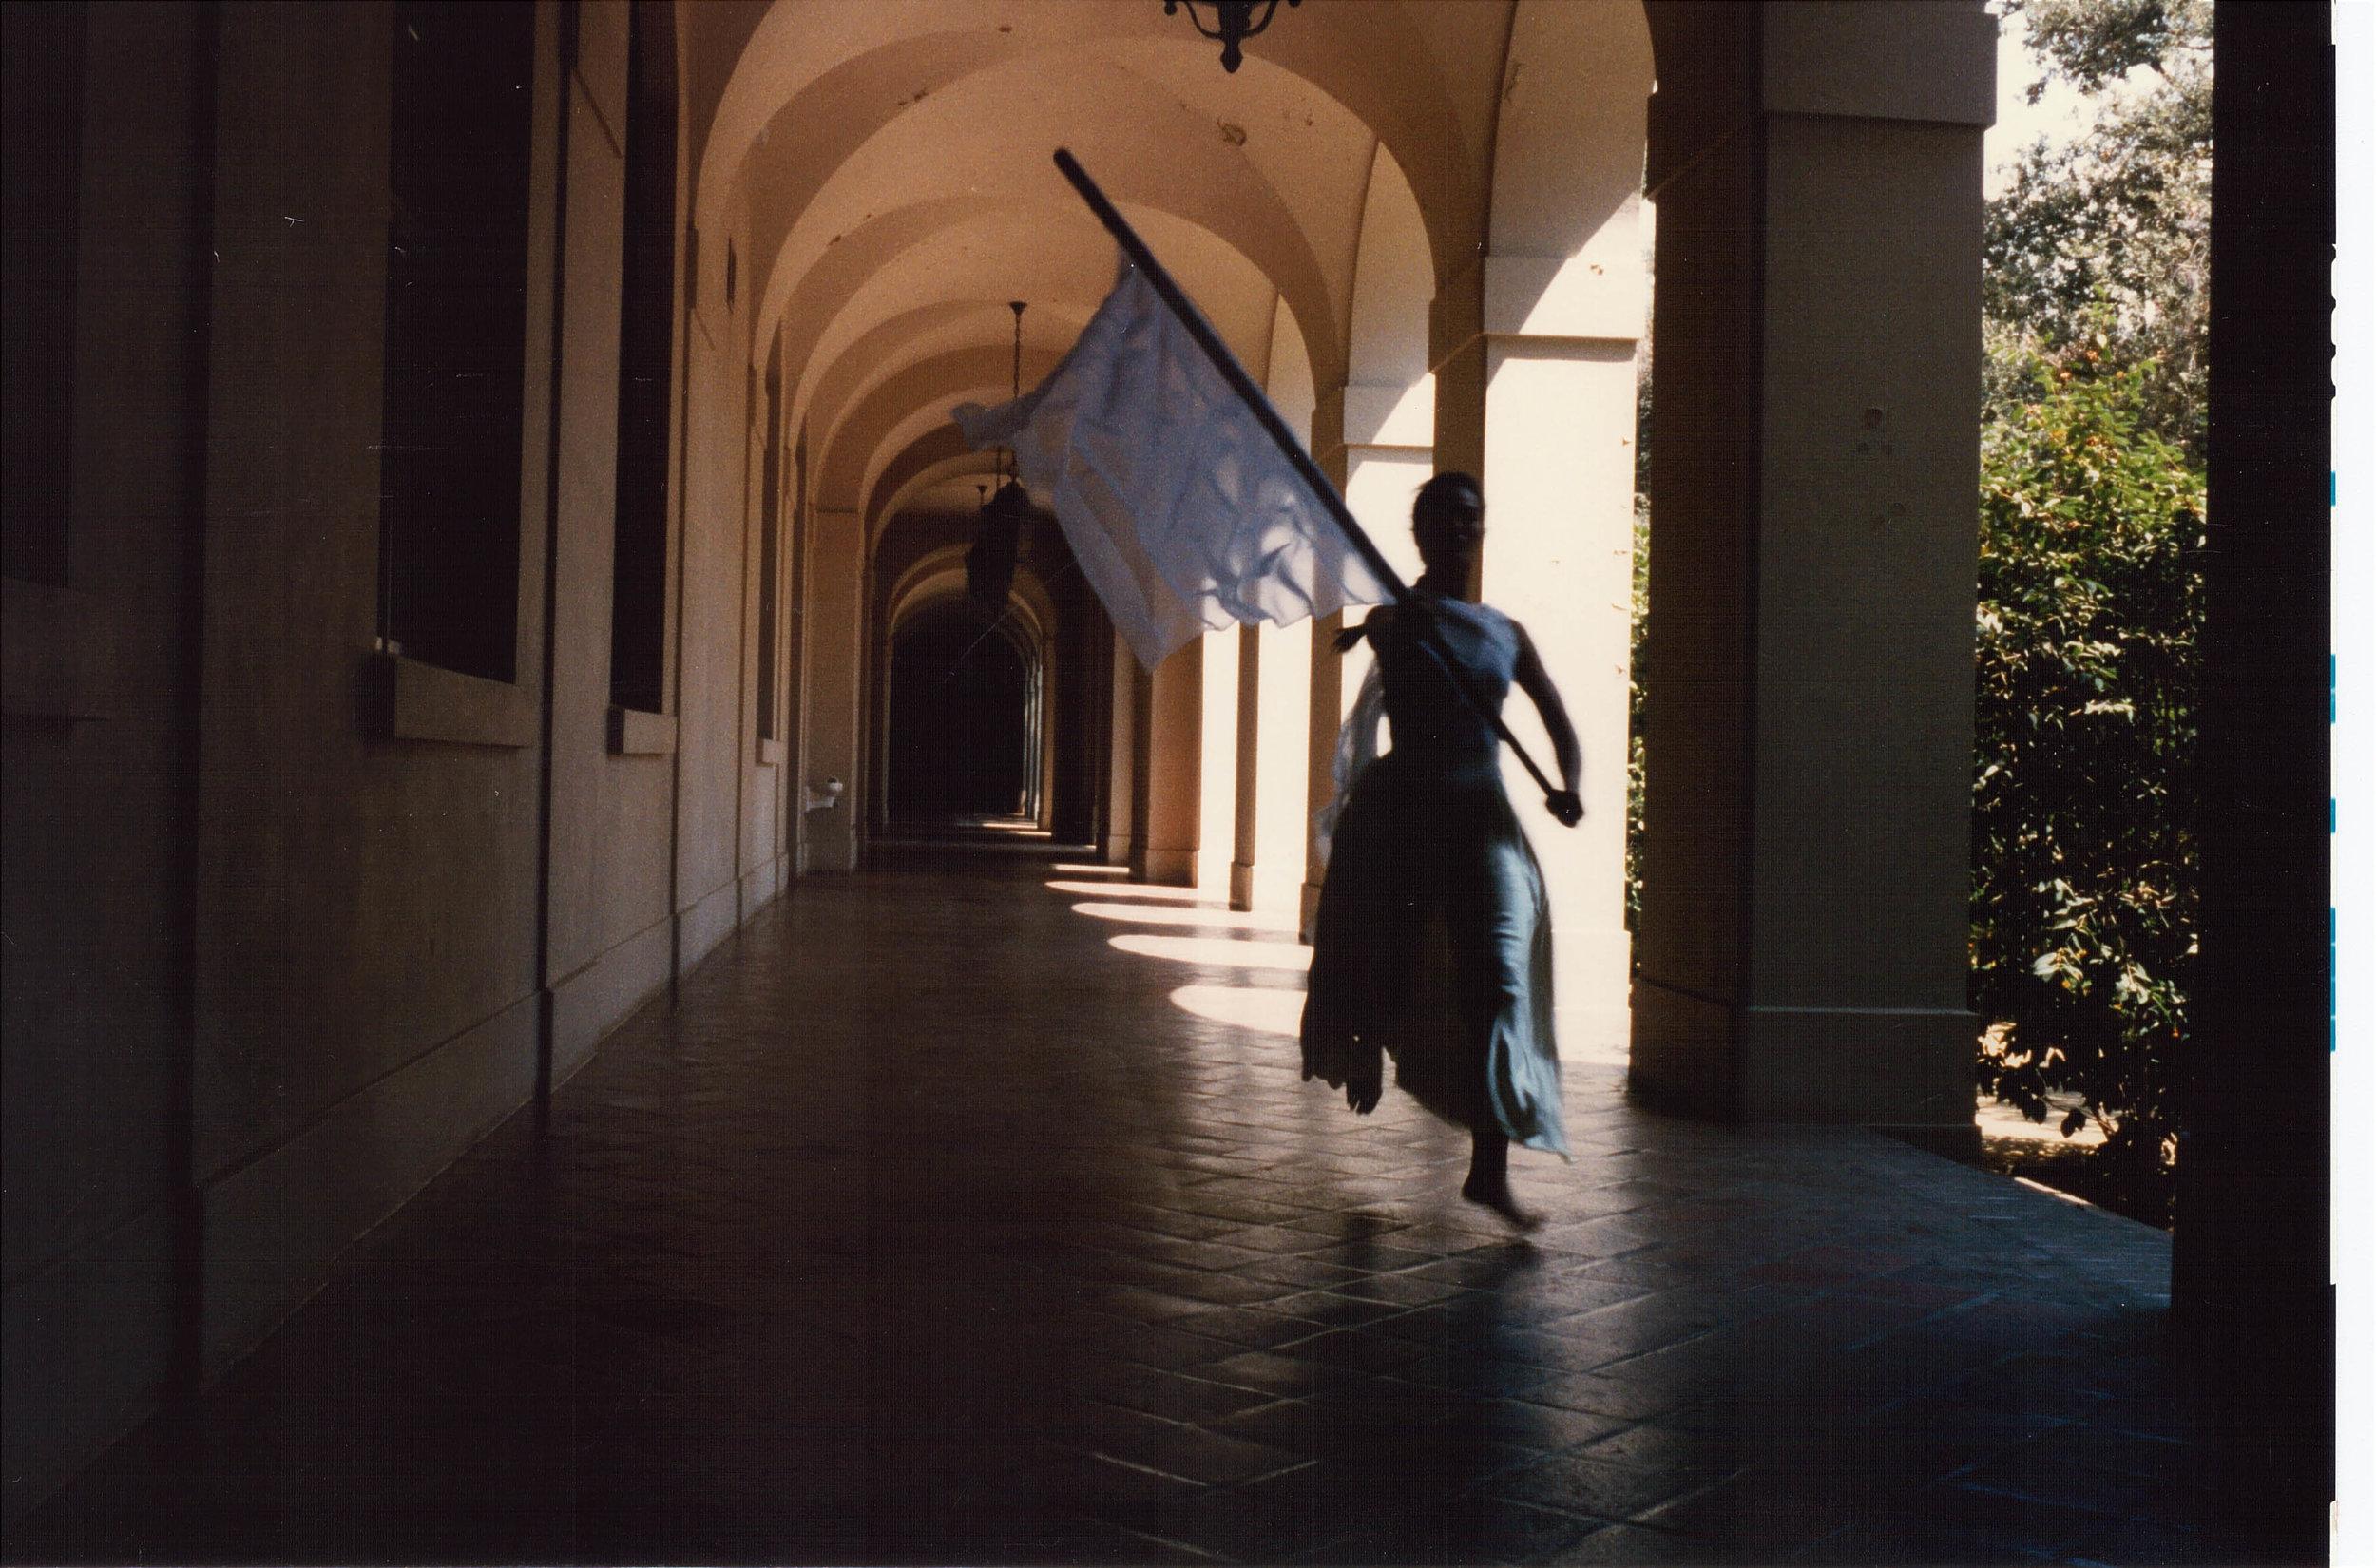 Searching for Simón Bolívar: One Poet's Journey,directed by José Sánchez-H